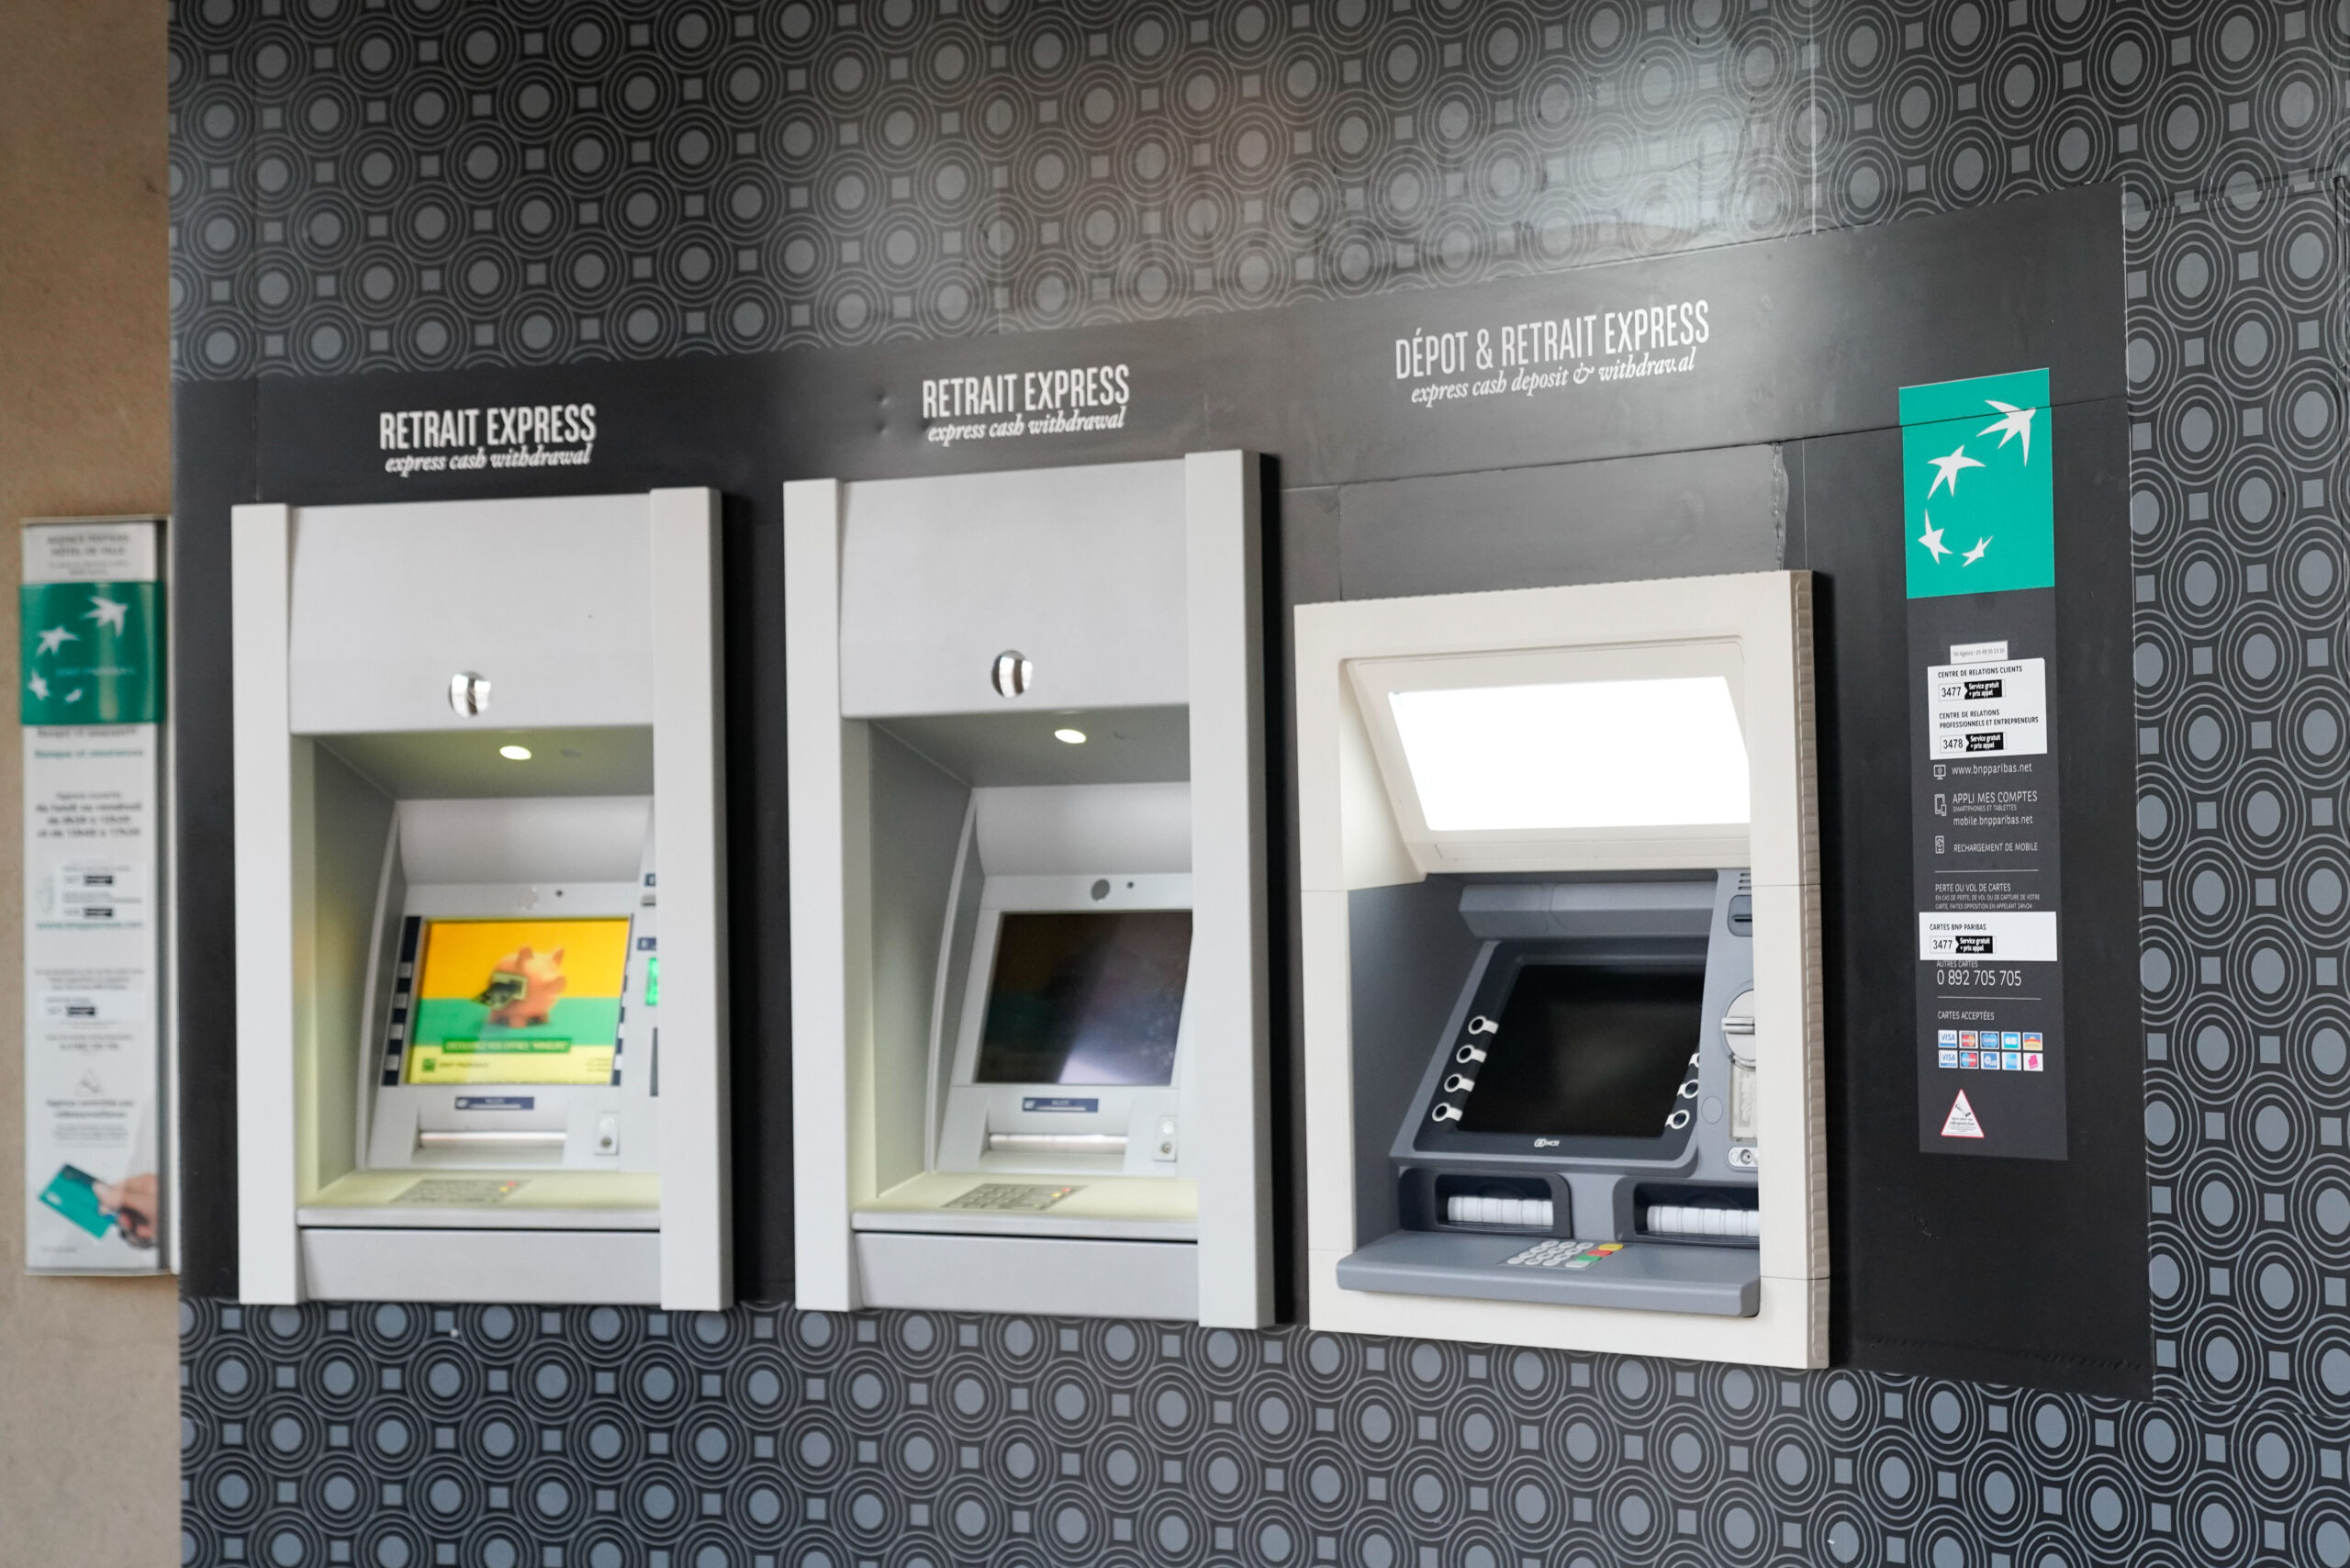 Bank Paris Frankrike minibank ta ut penger valuta ATM